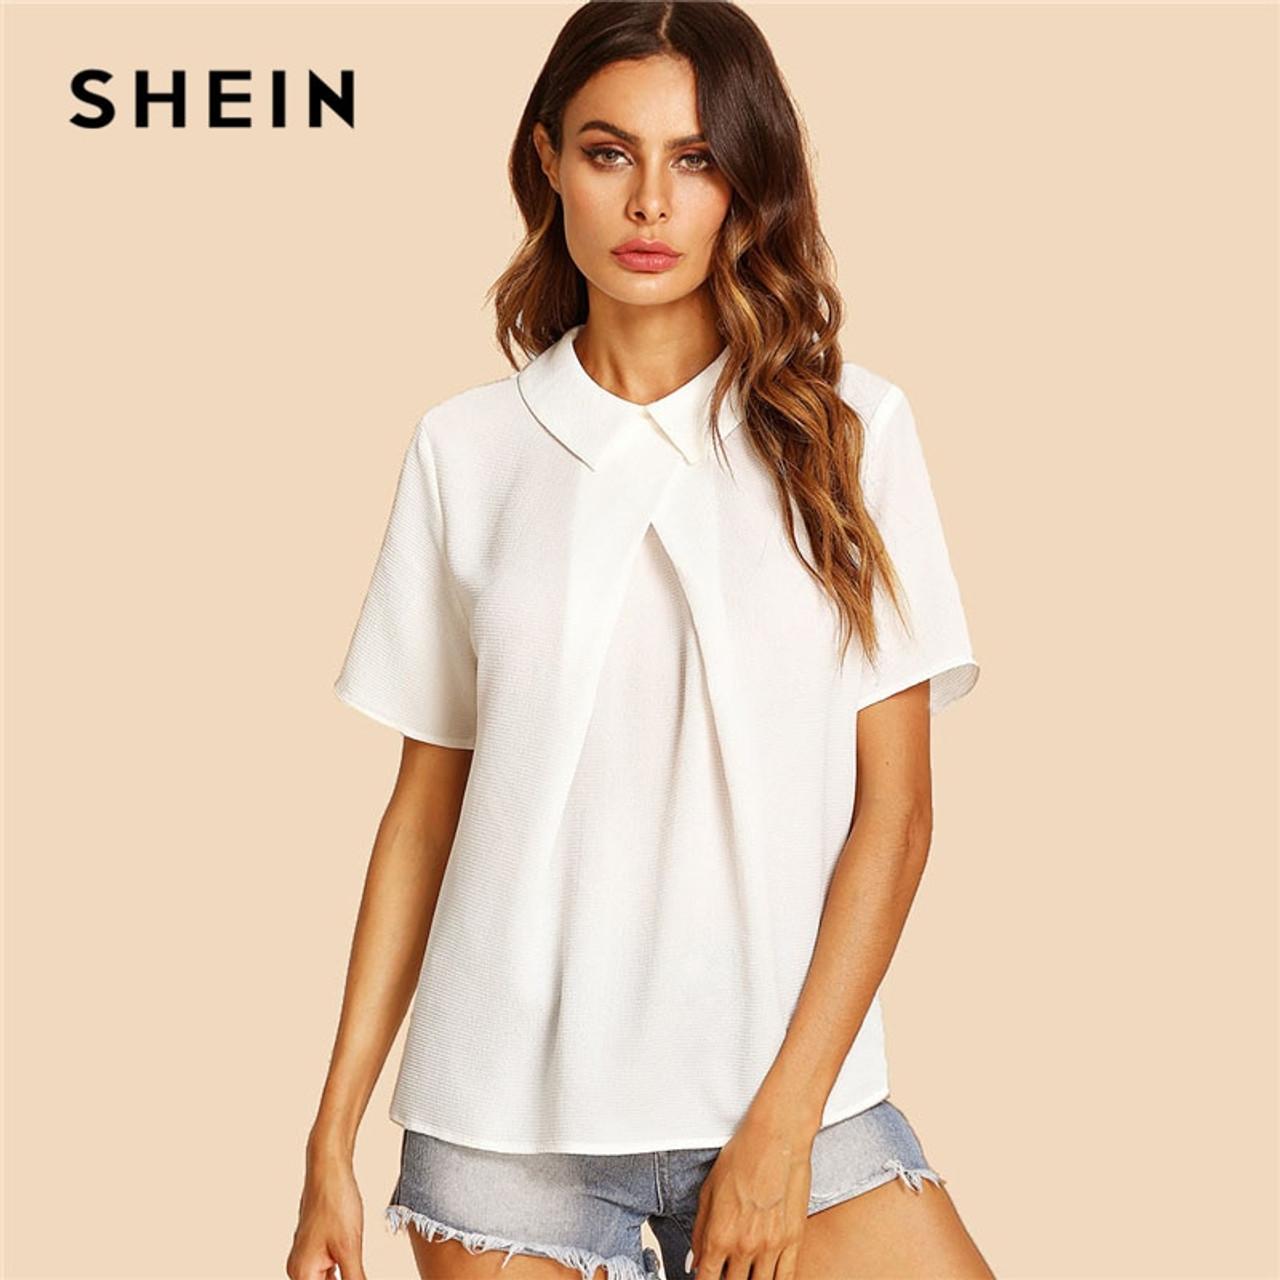 2fabc335e2 SHEIN White Overlap Fold Plain Top Women Peter Pan Collar Short Sleeve  Button Soild Blouse 2018 ...